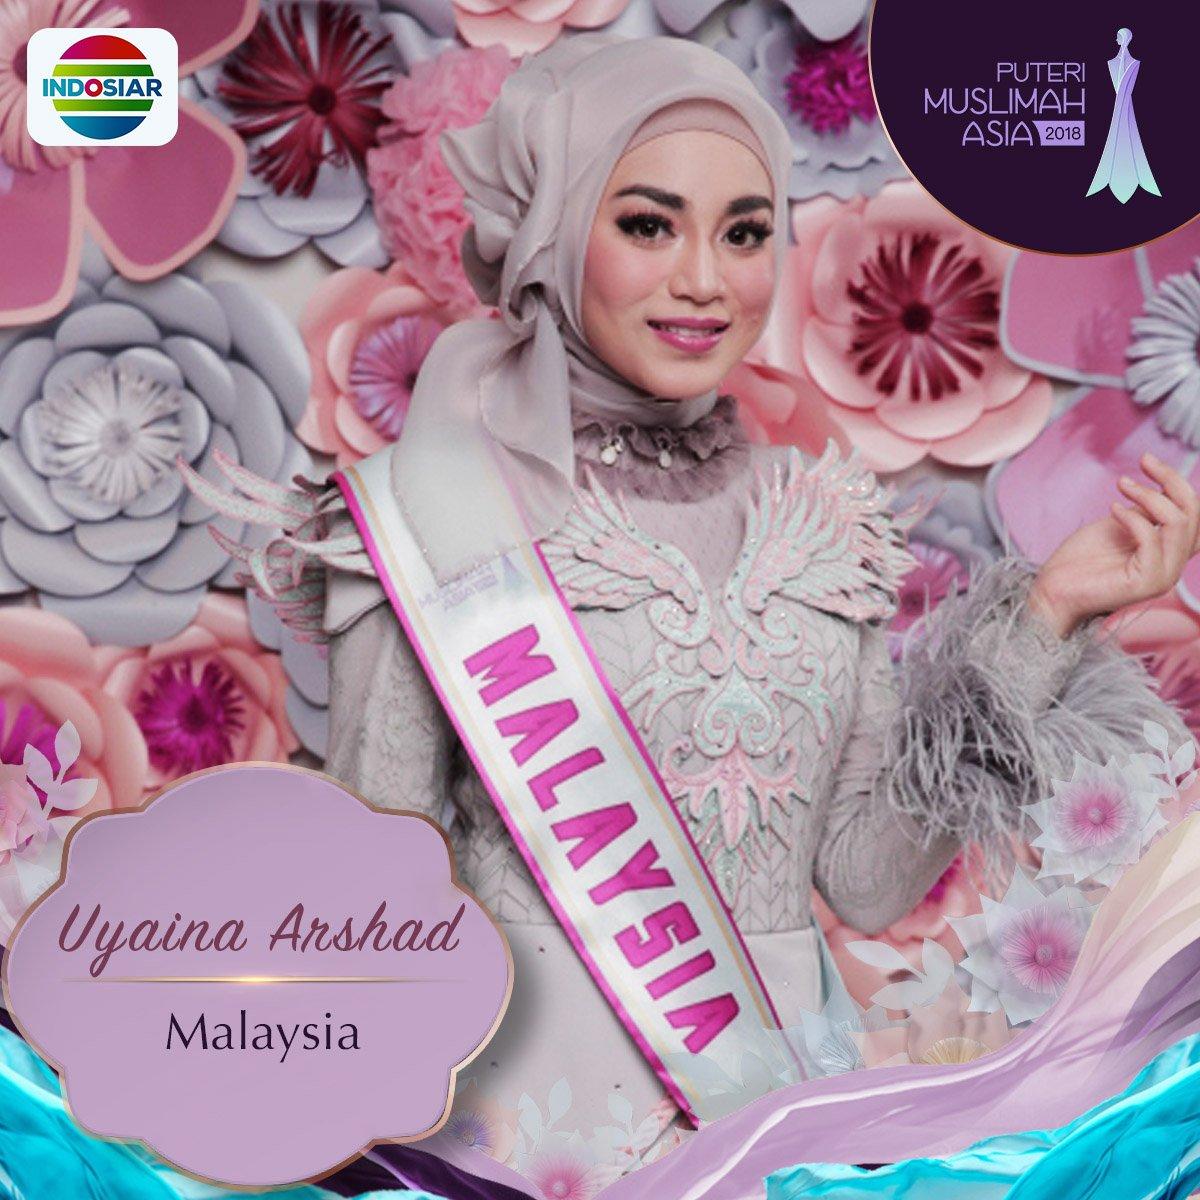 Image result for uyaina arshad menang puteri muslimah asia 2018